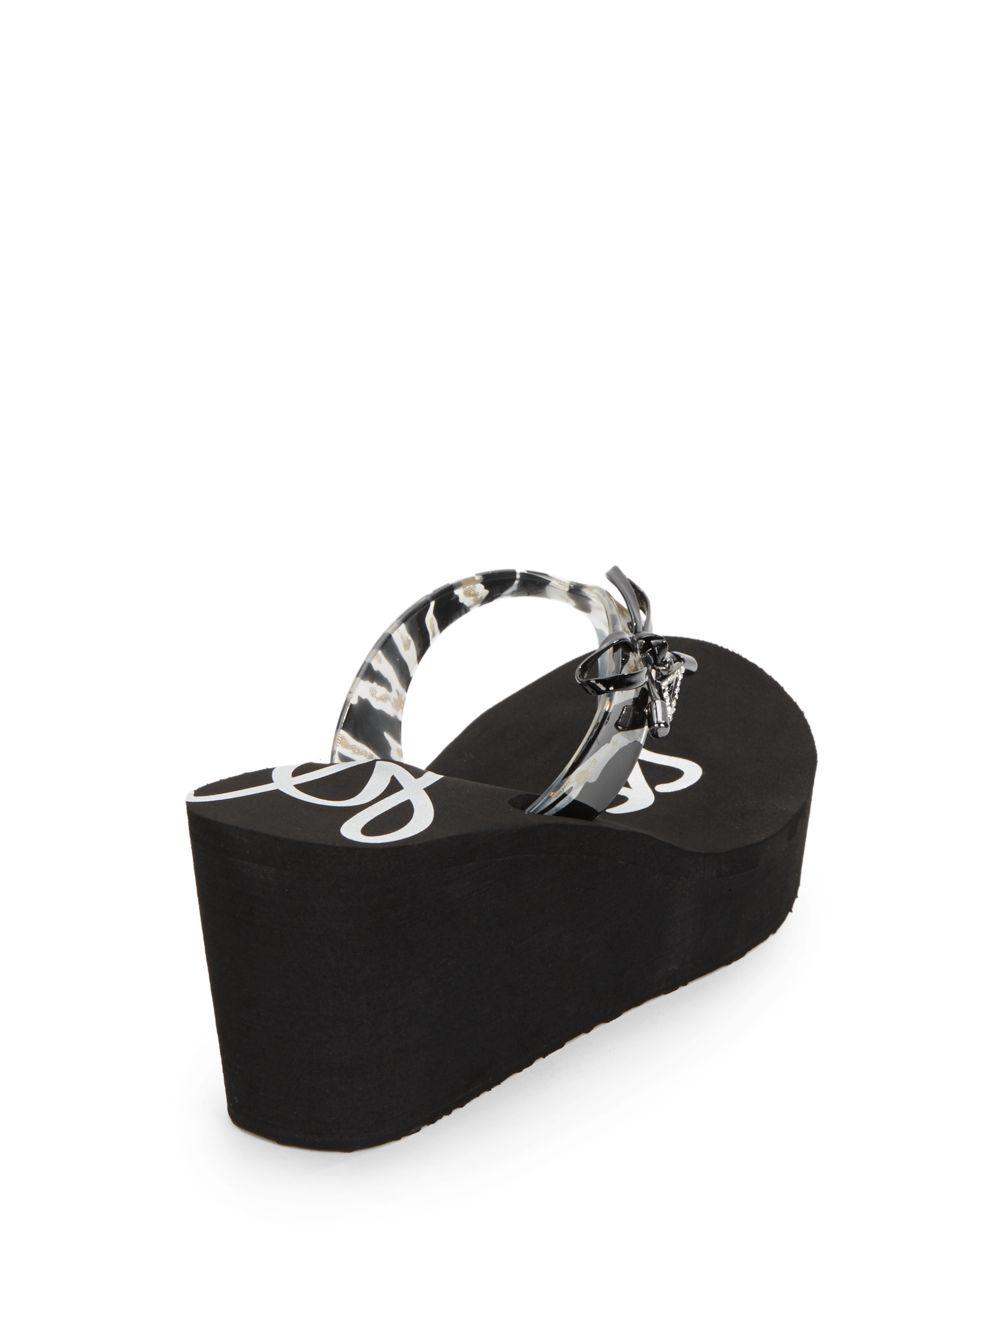 5b5b233f1 ... Lyst - Guess Syona Zebra-Print Bow Platform Wedge Sandals in Black huge  inventory 40861 ...